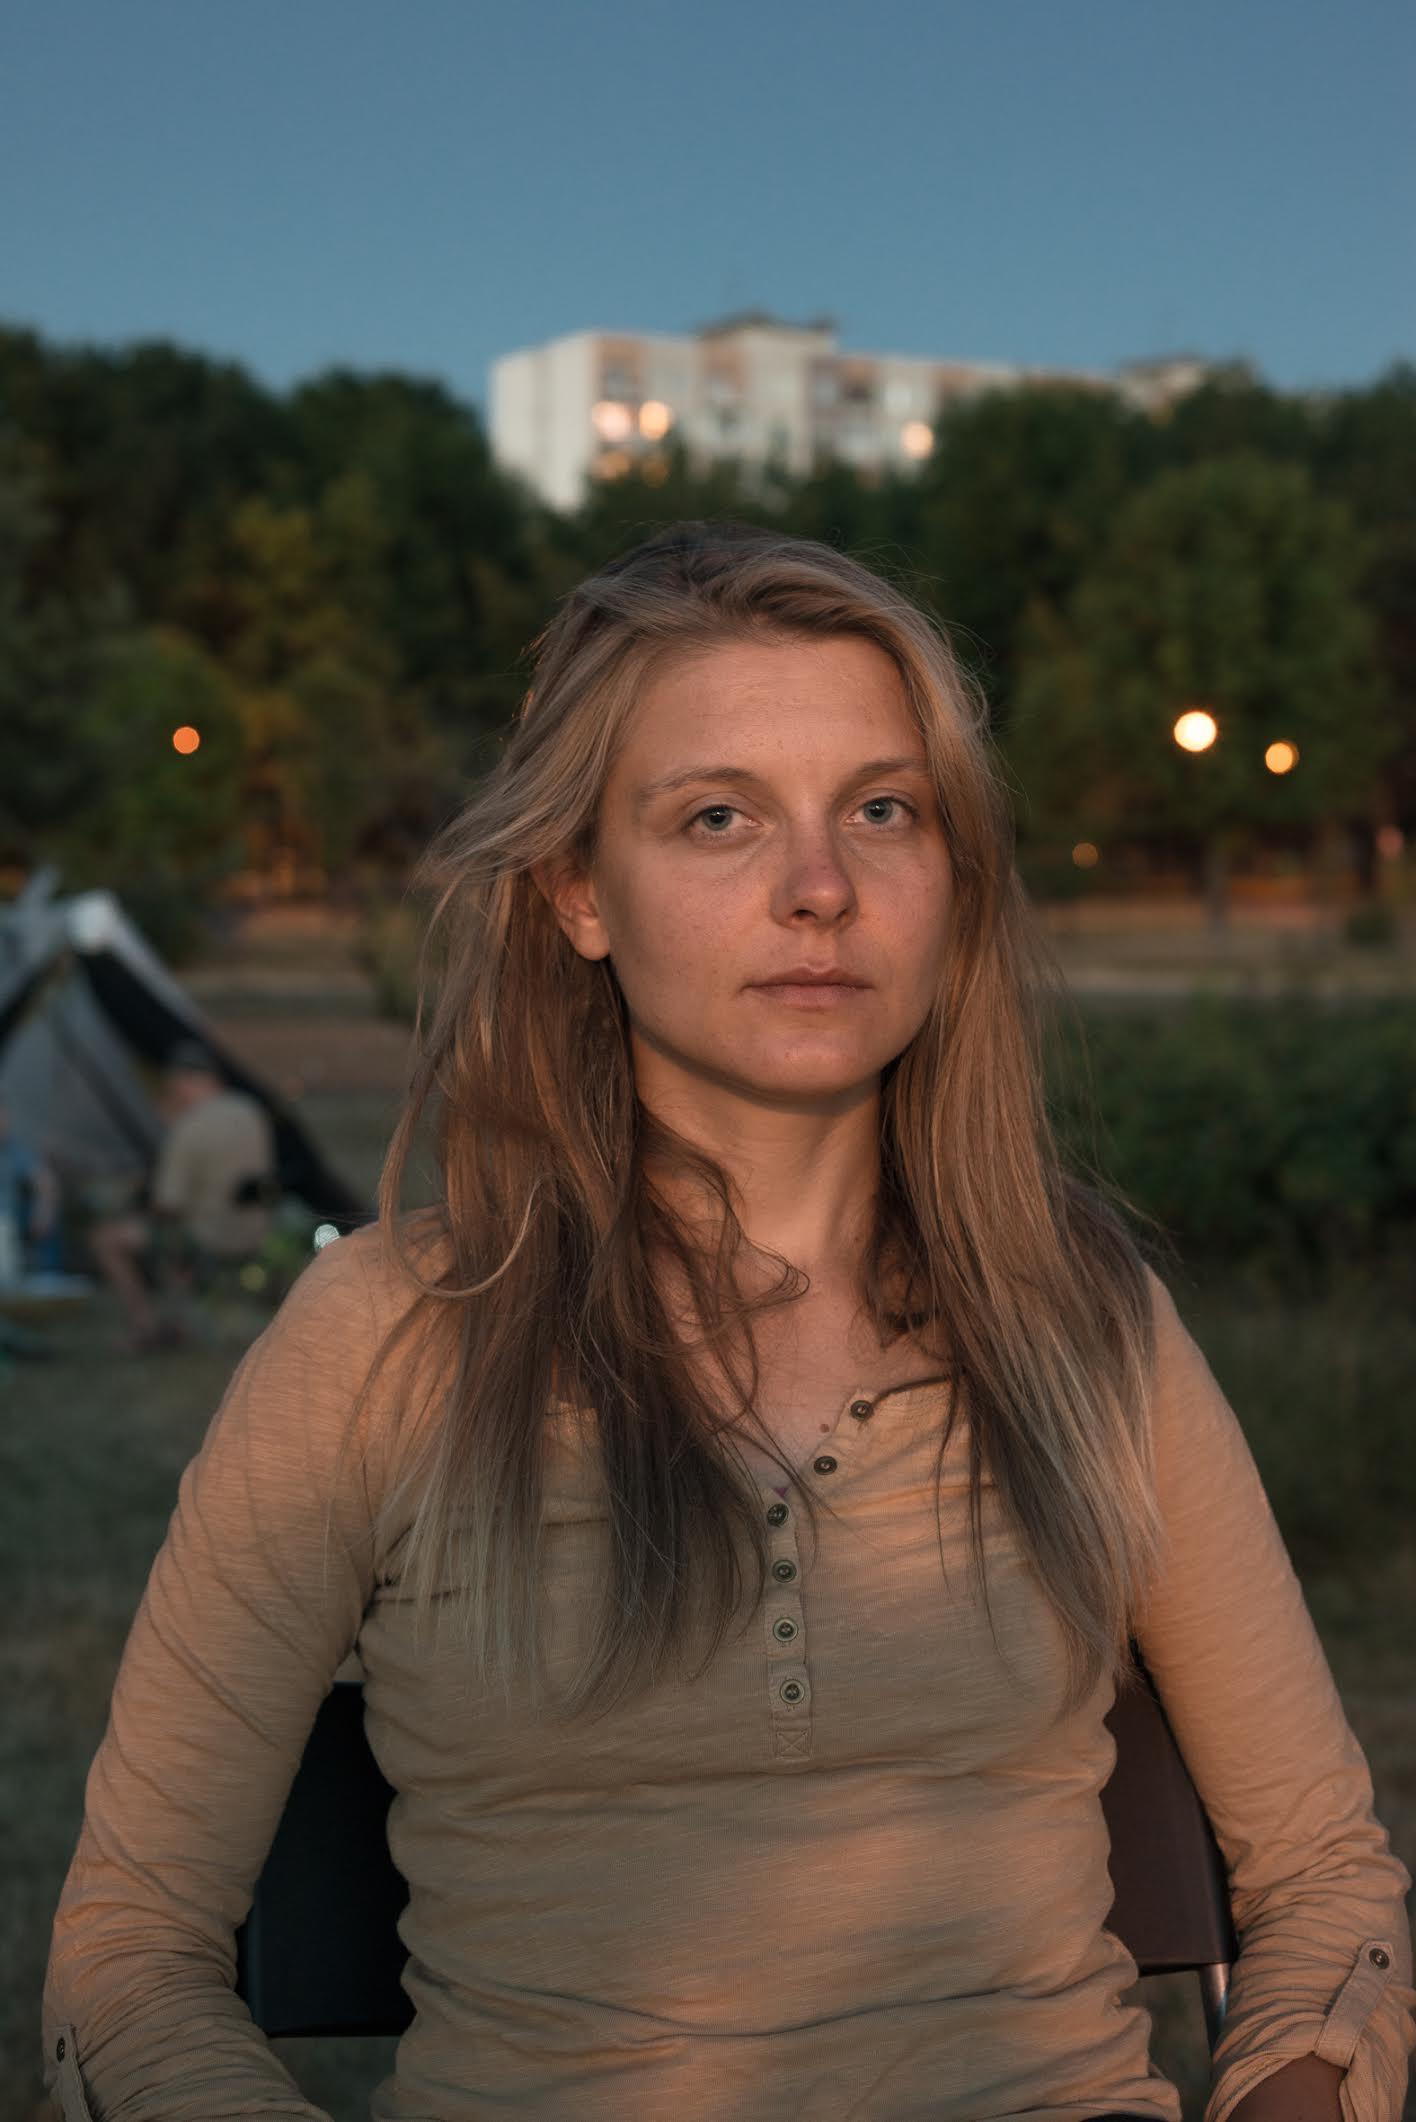 Honorata Martin, fot.Szymon Rogiński